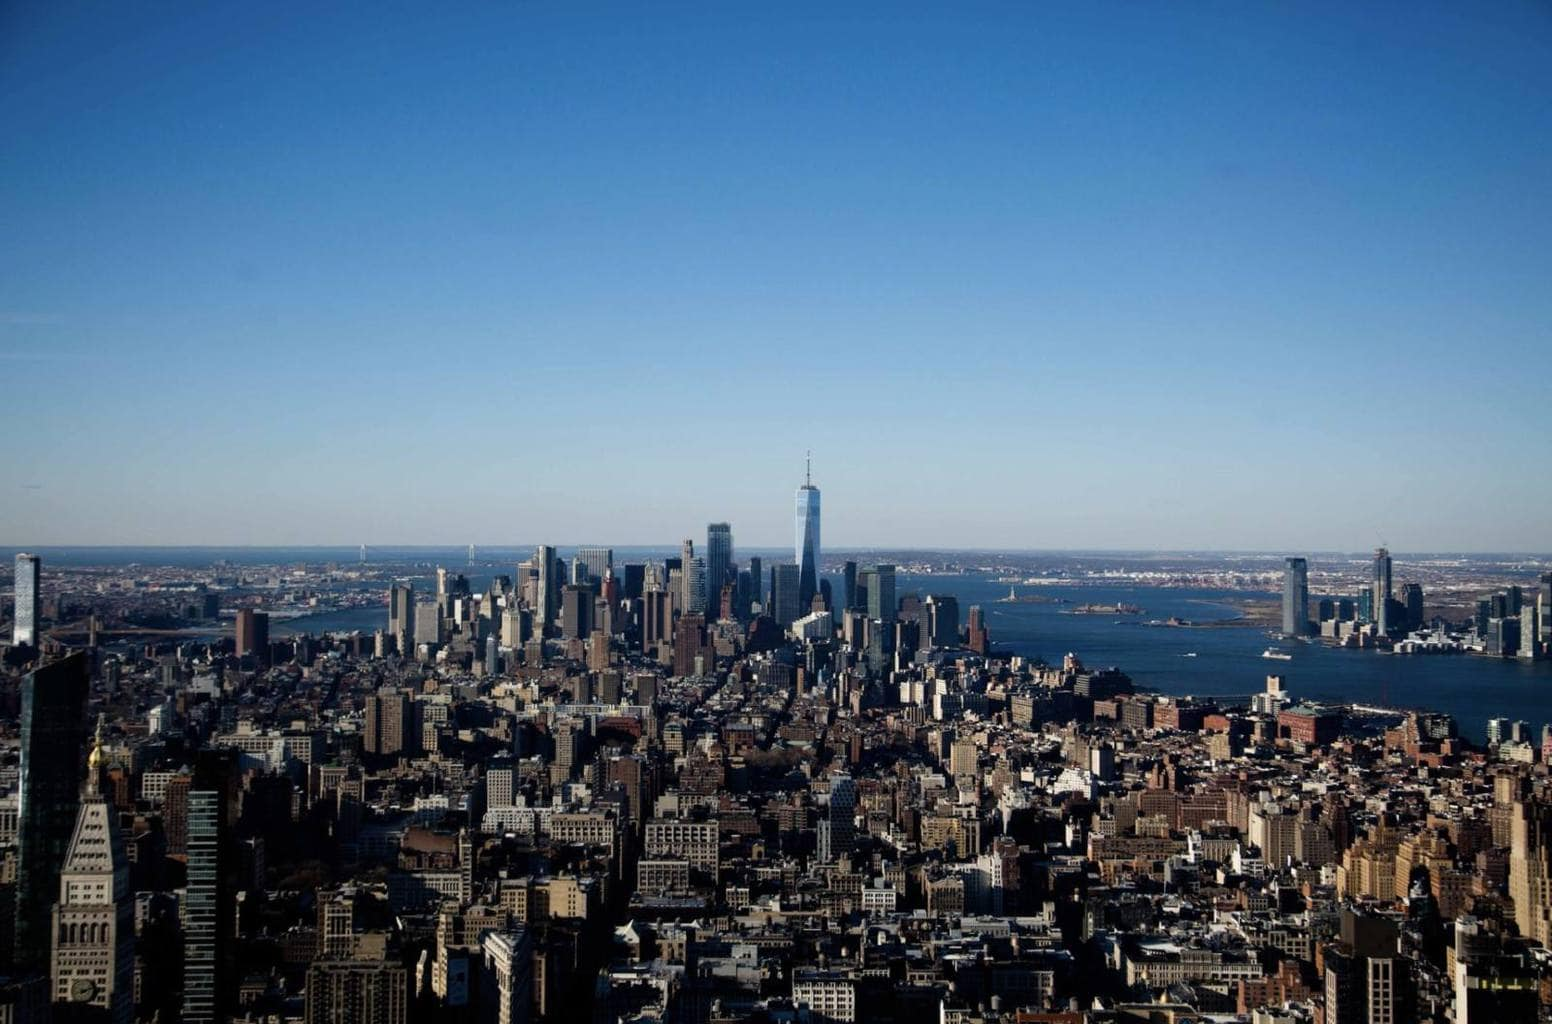 New York CityPASS Review 2019